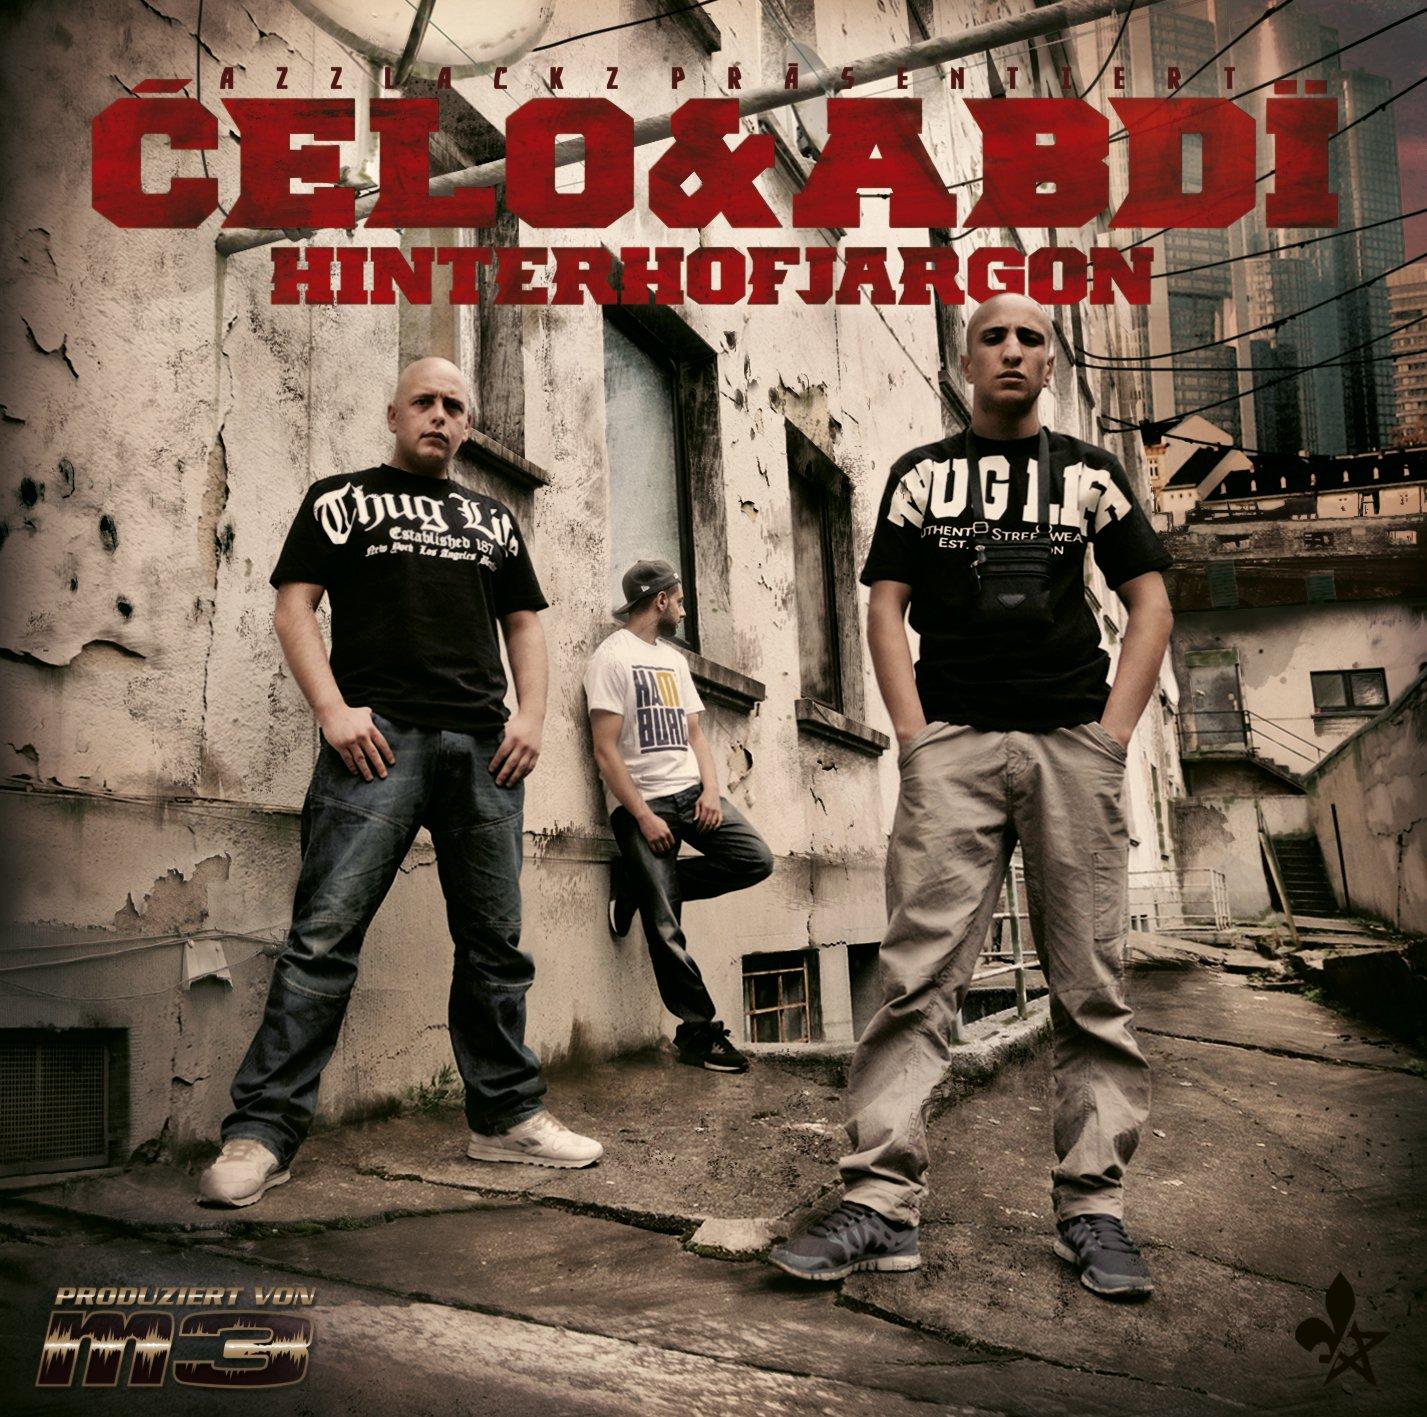 Celo Abdi Hinterhofjargon Amazon Com Music